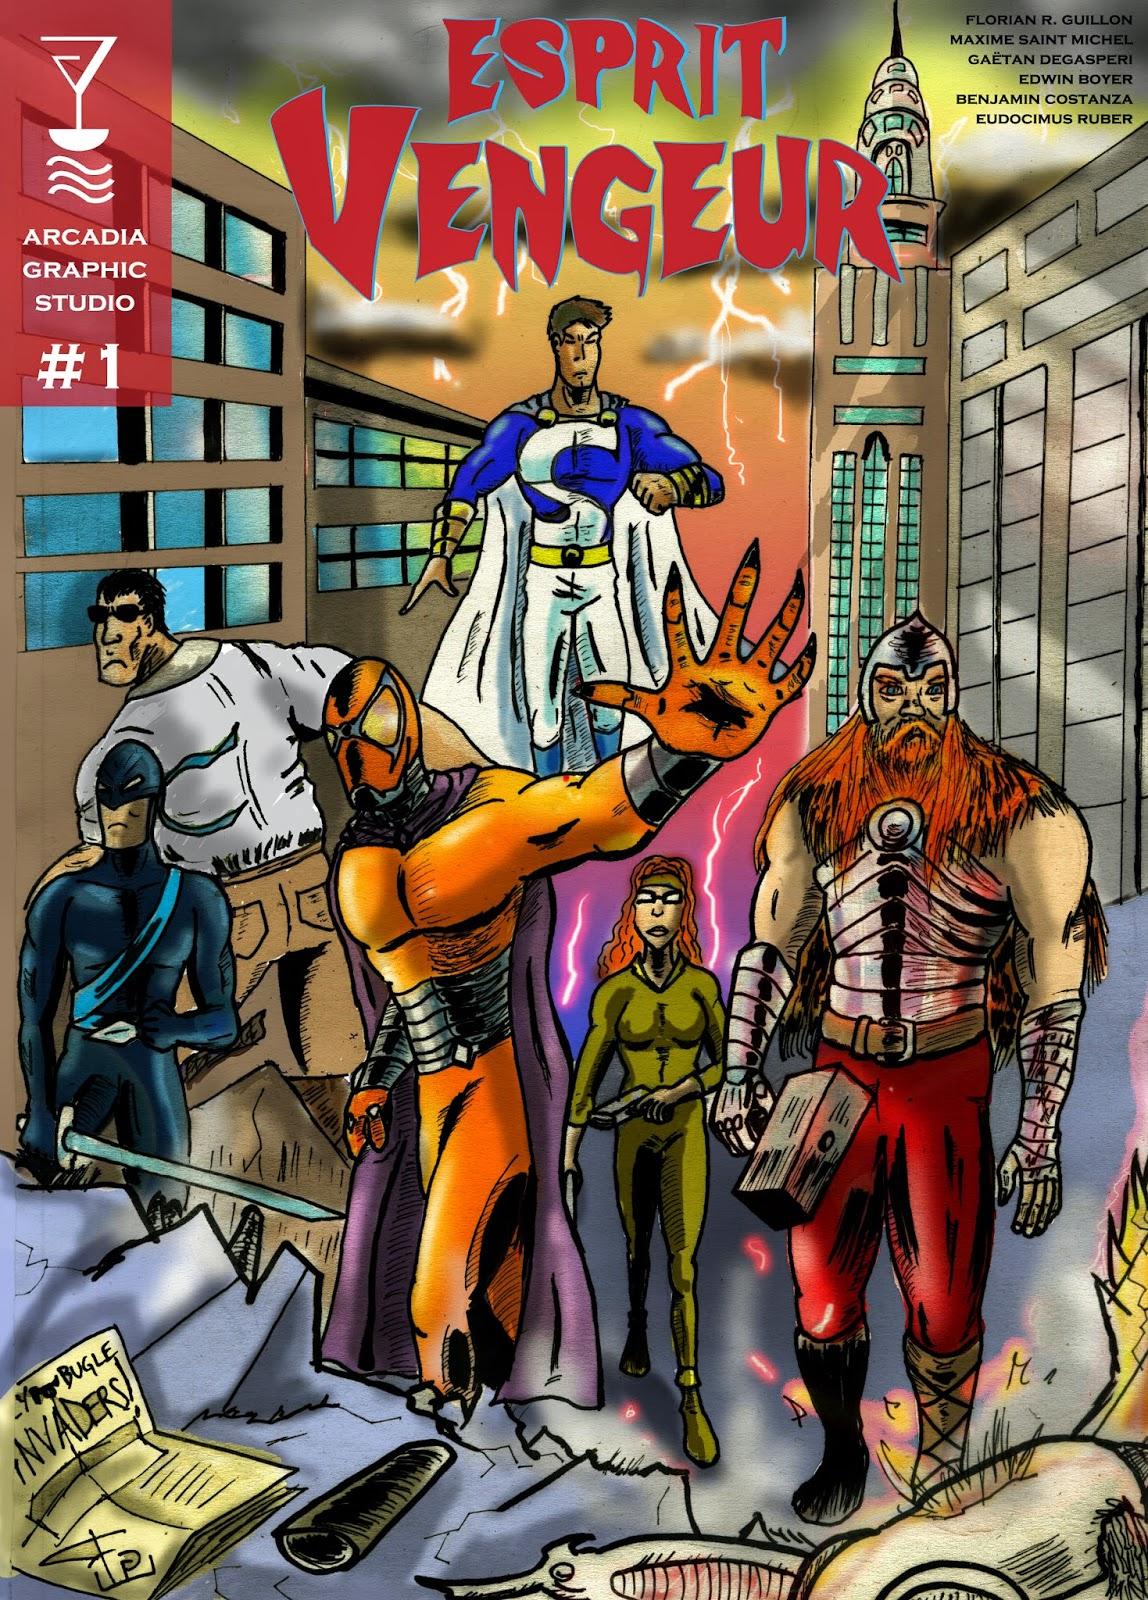 http://www.amilova.com/fr/BD-manga/9383/esprit-vengeur/chapitre-1/page-1.html